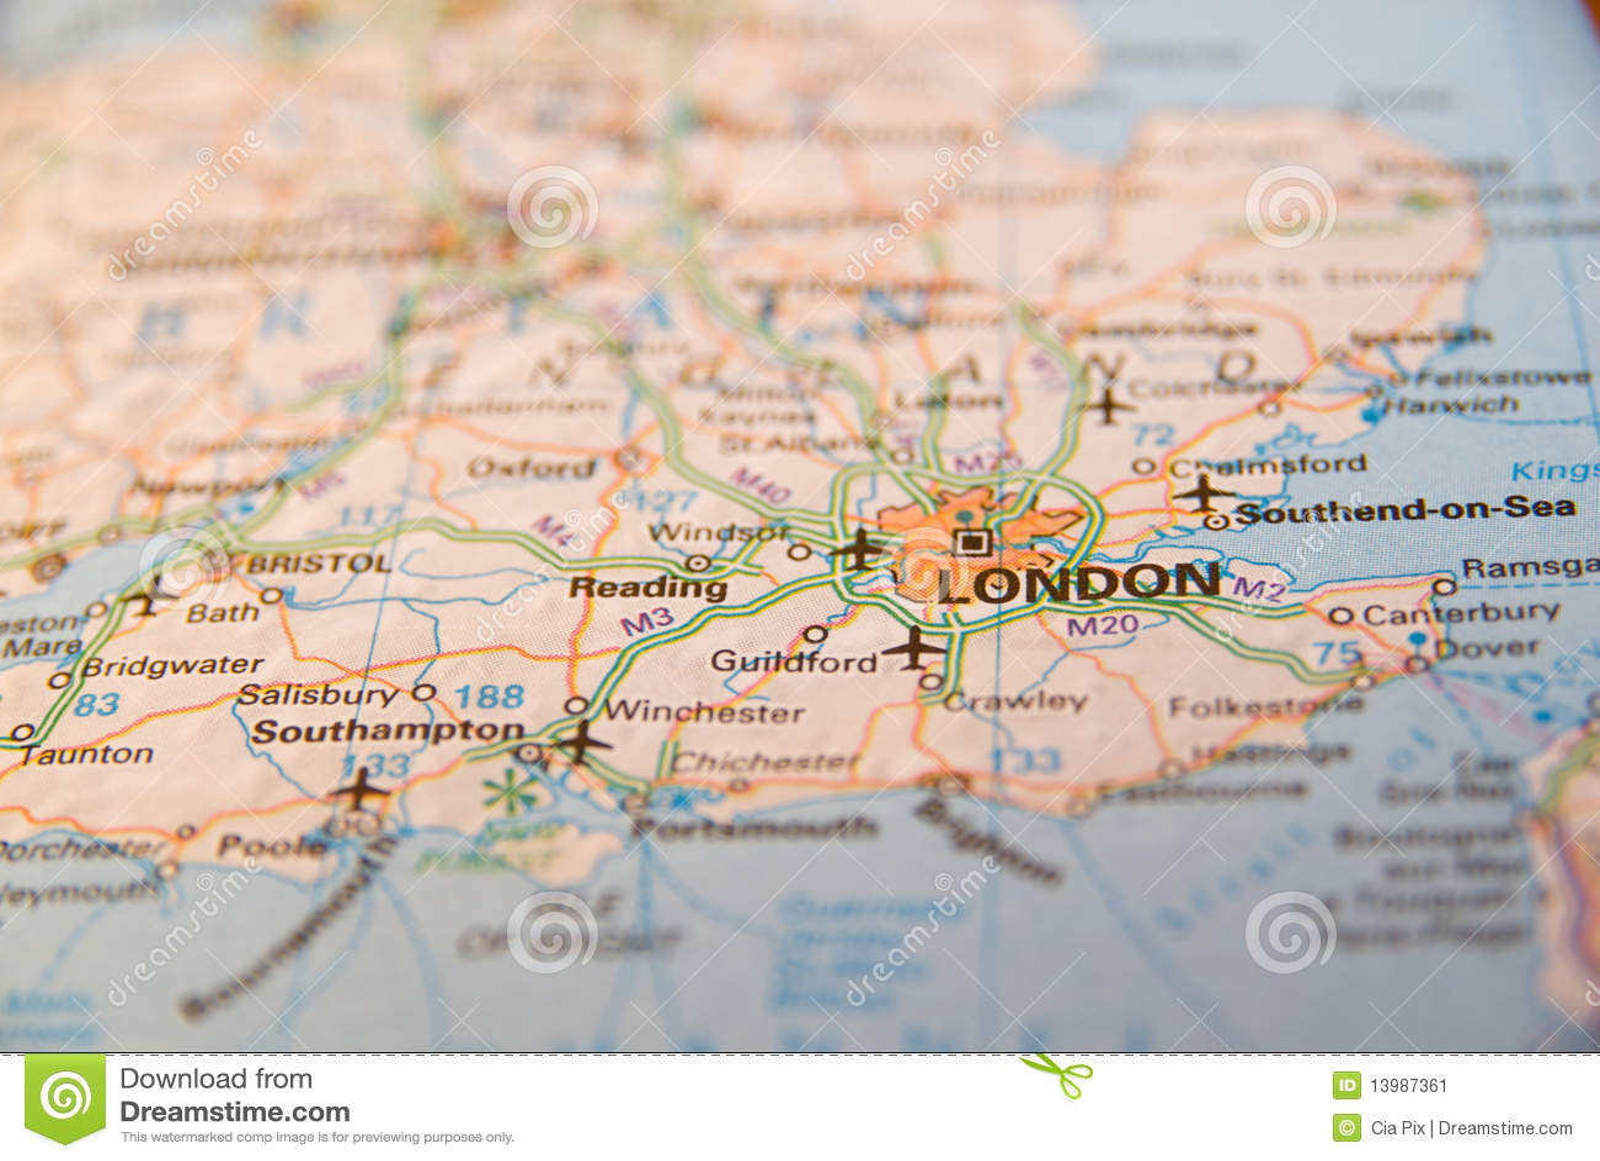 mapa do sul de inglaterra Costa Sul Do Mapa De Inglaterra Imagem de Stock   Imagem de  mapa do sul de inglaterra